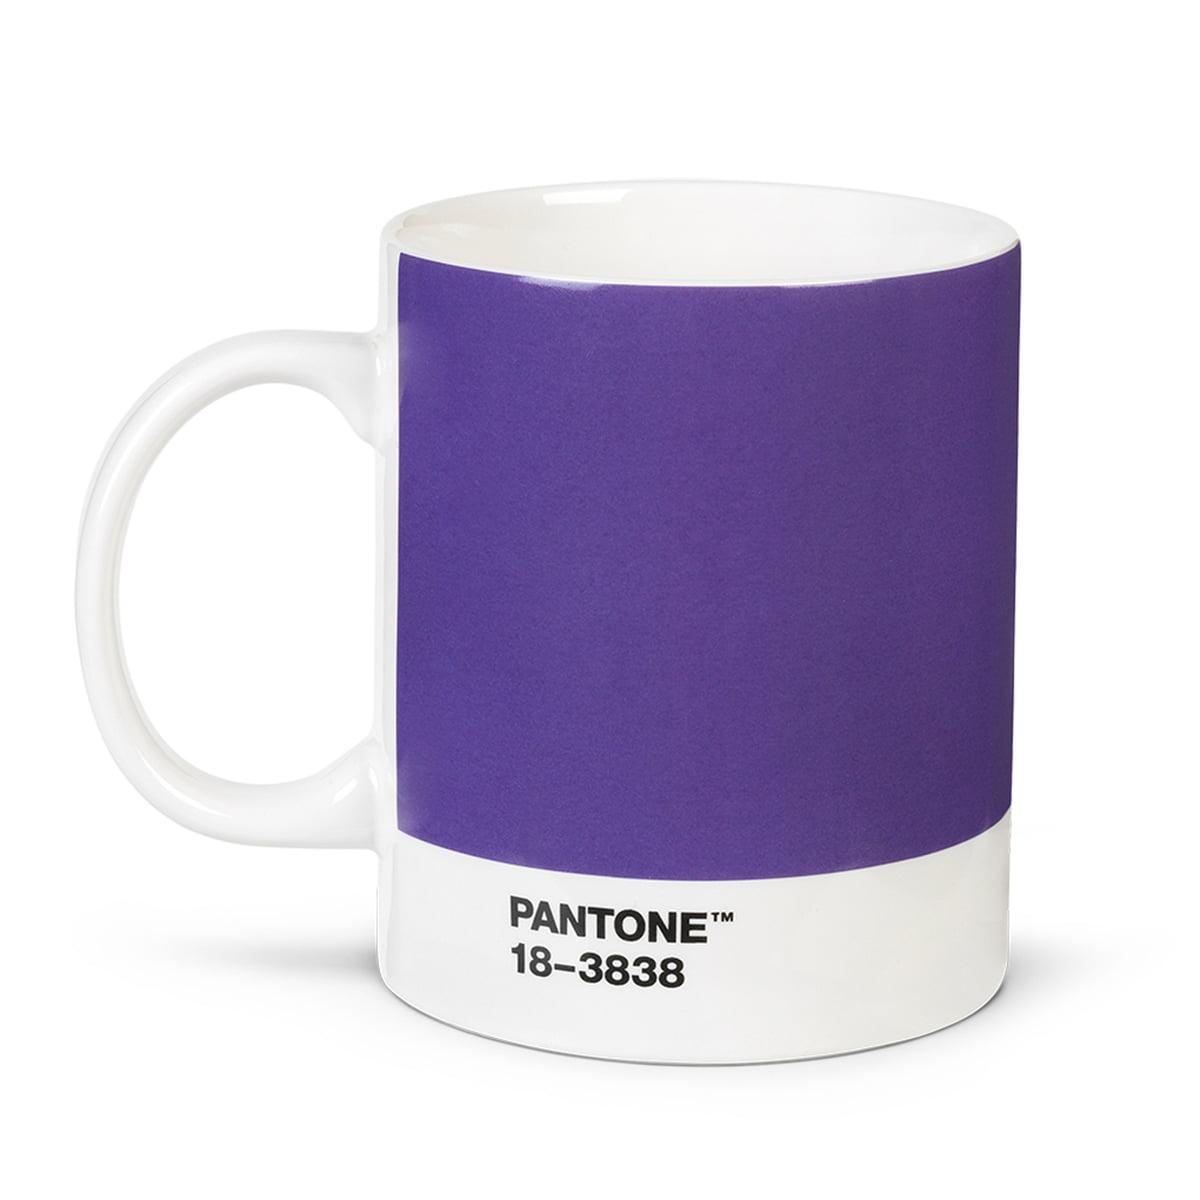 Pantone Tassen pantone cup pantone universe shop